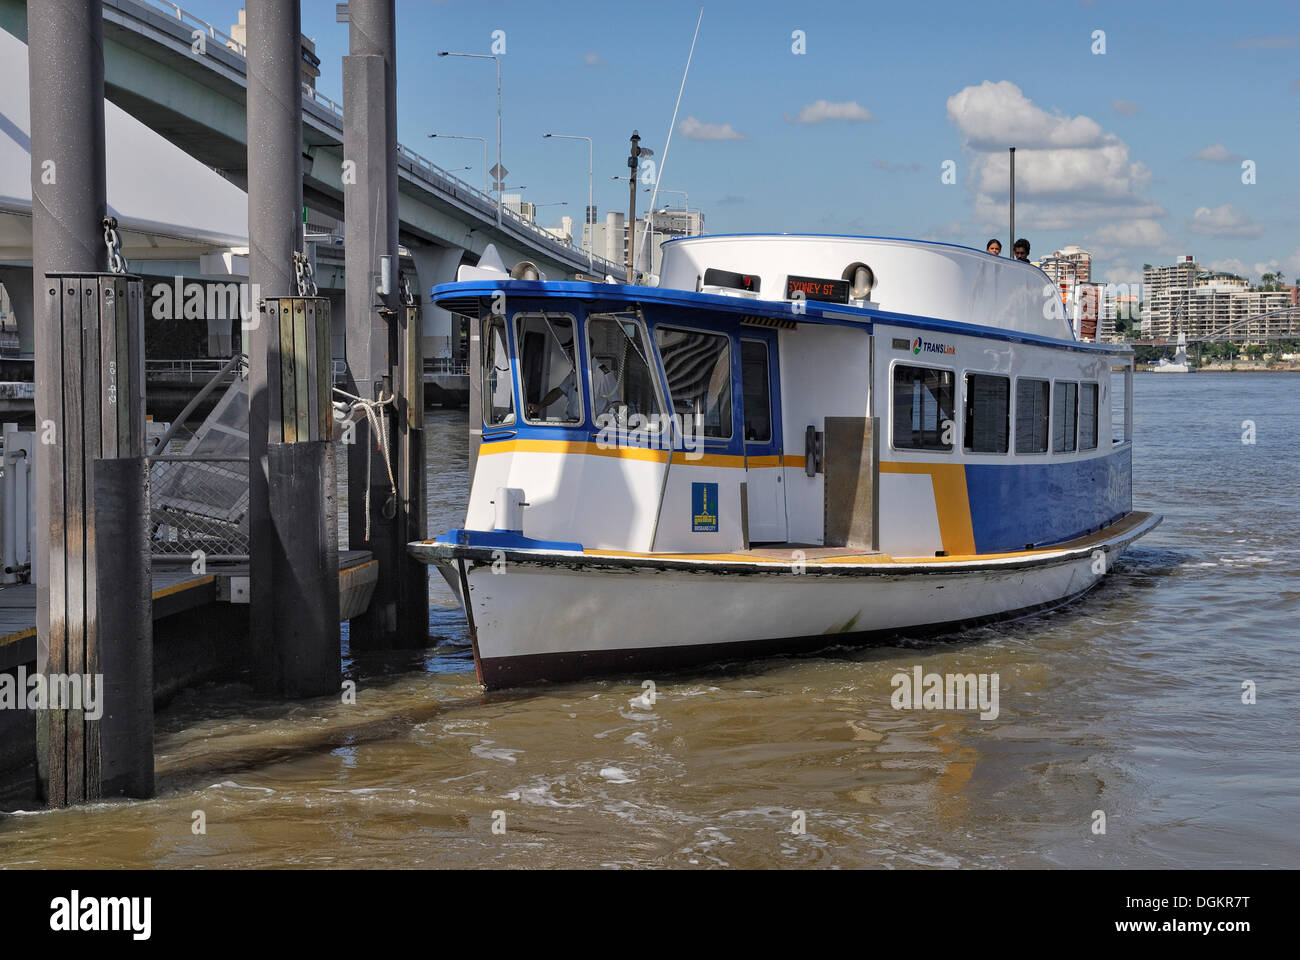 Trans Link ferry, Brisbane River, Brisbane, Queensland, Australia - Stock Image